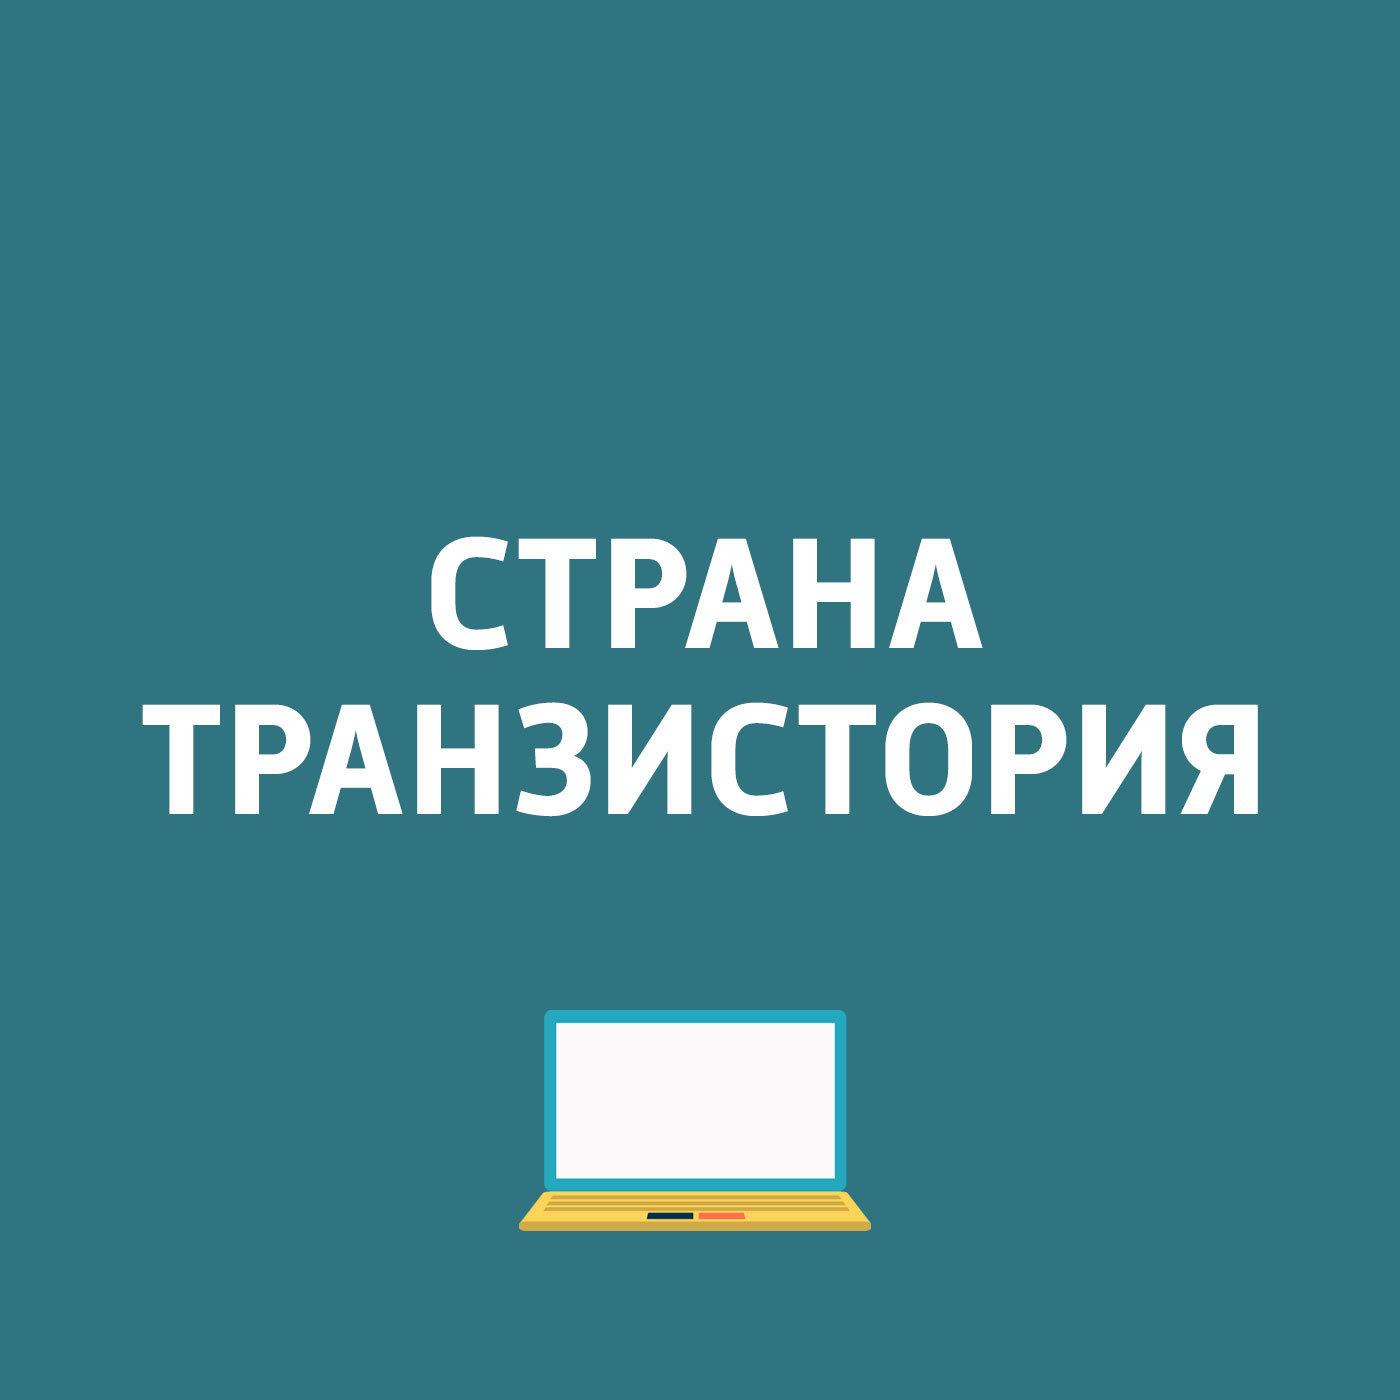 Картаев Павел Тест ZTE Blade V8 и наушники Sony mdr-1000x